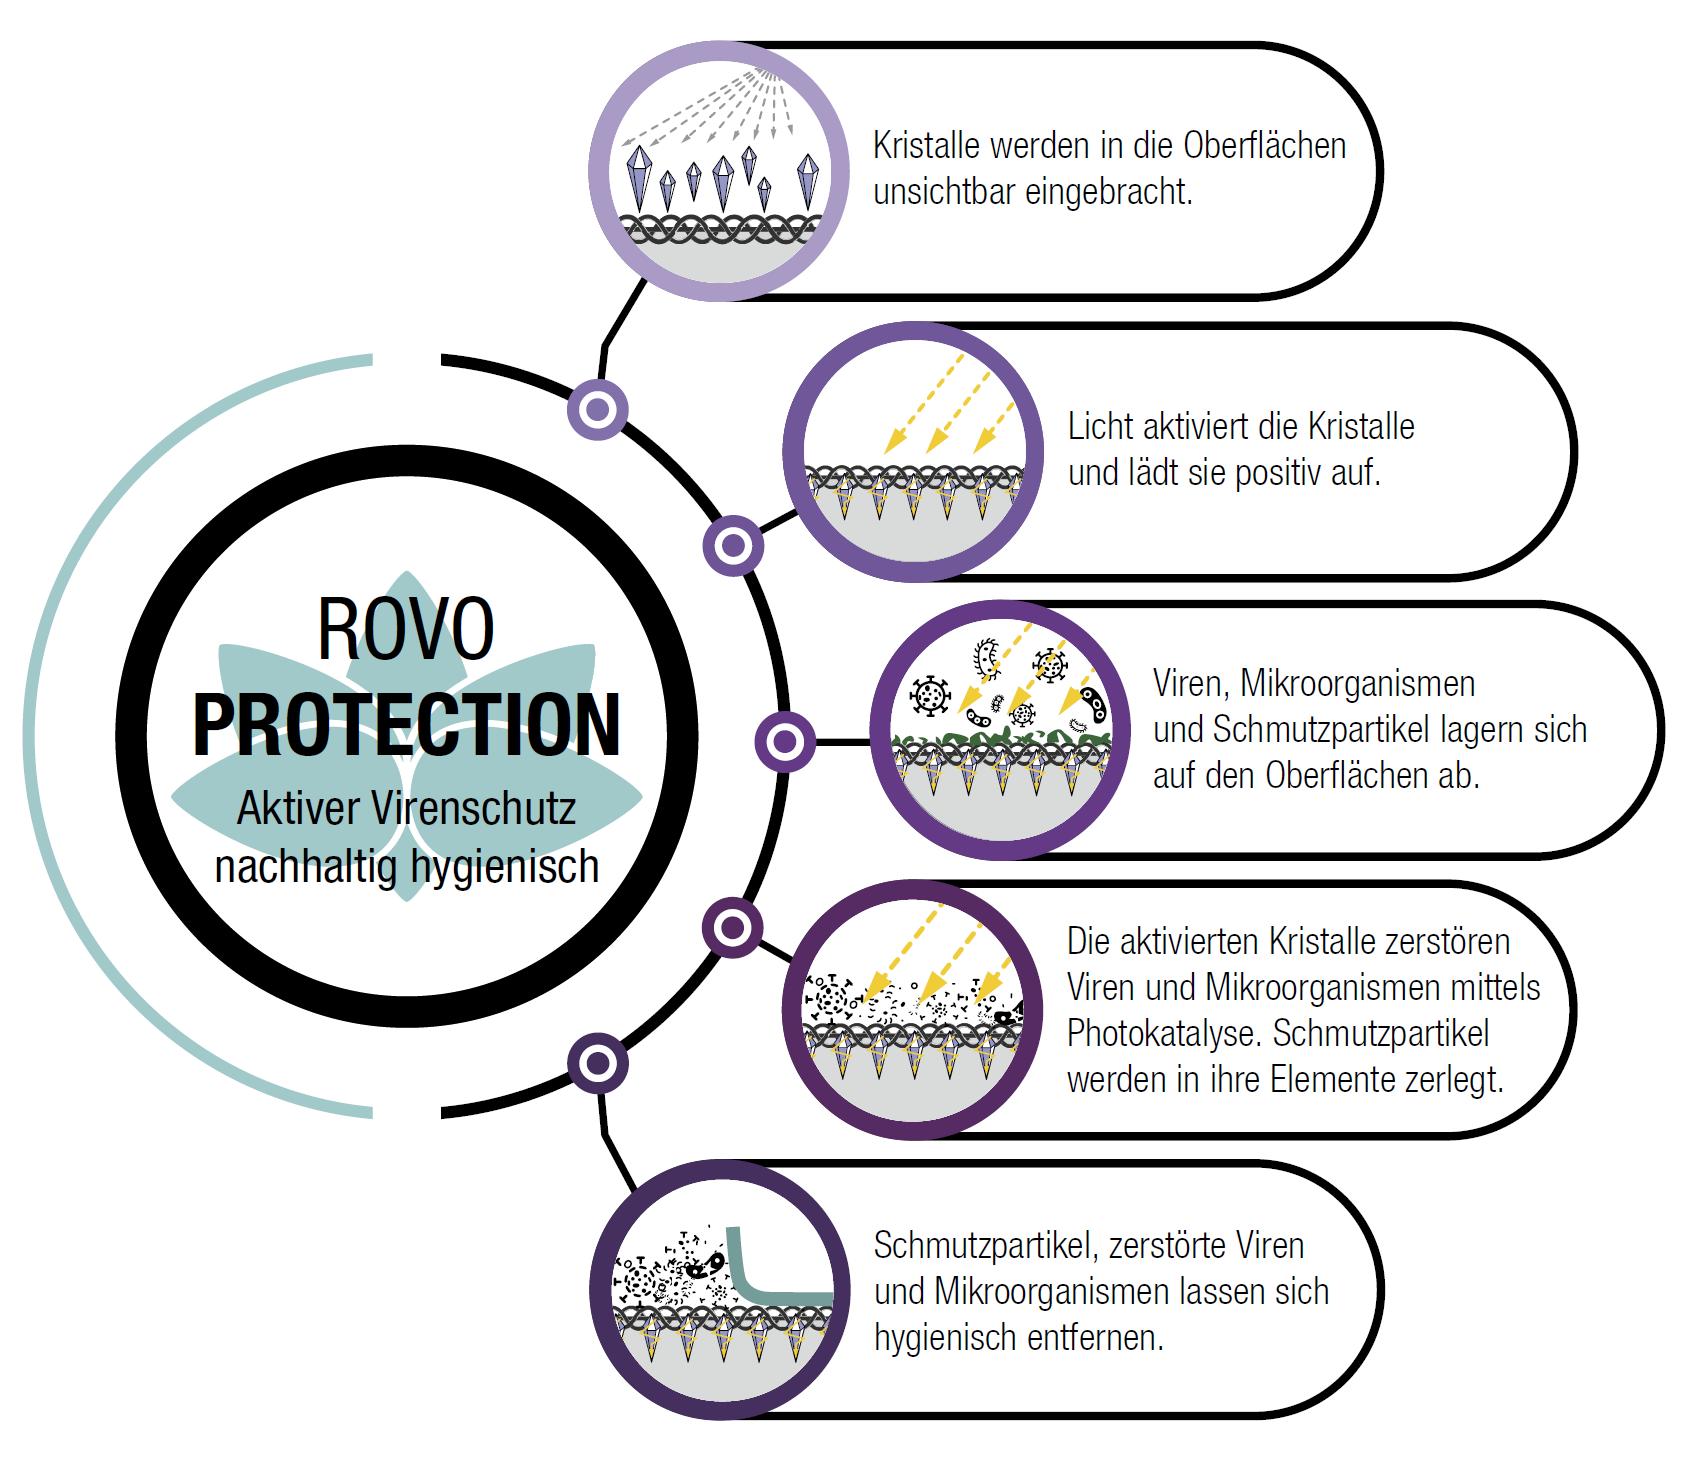 Rovo Protection